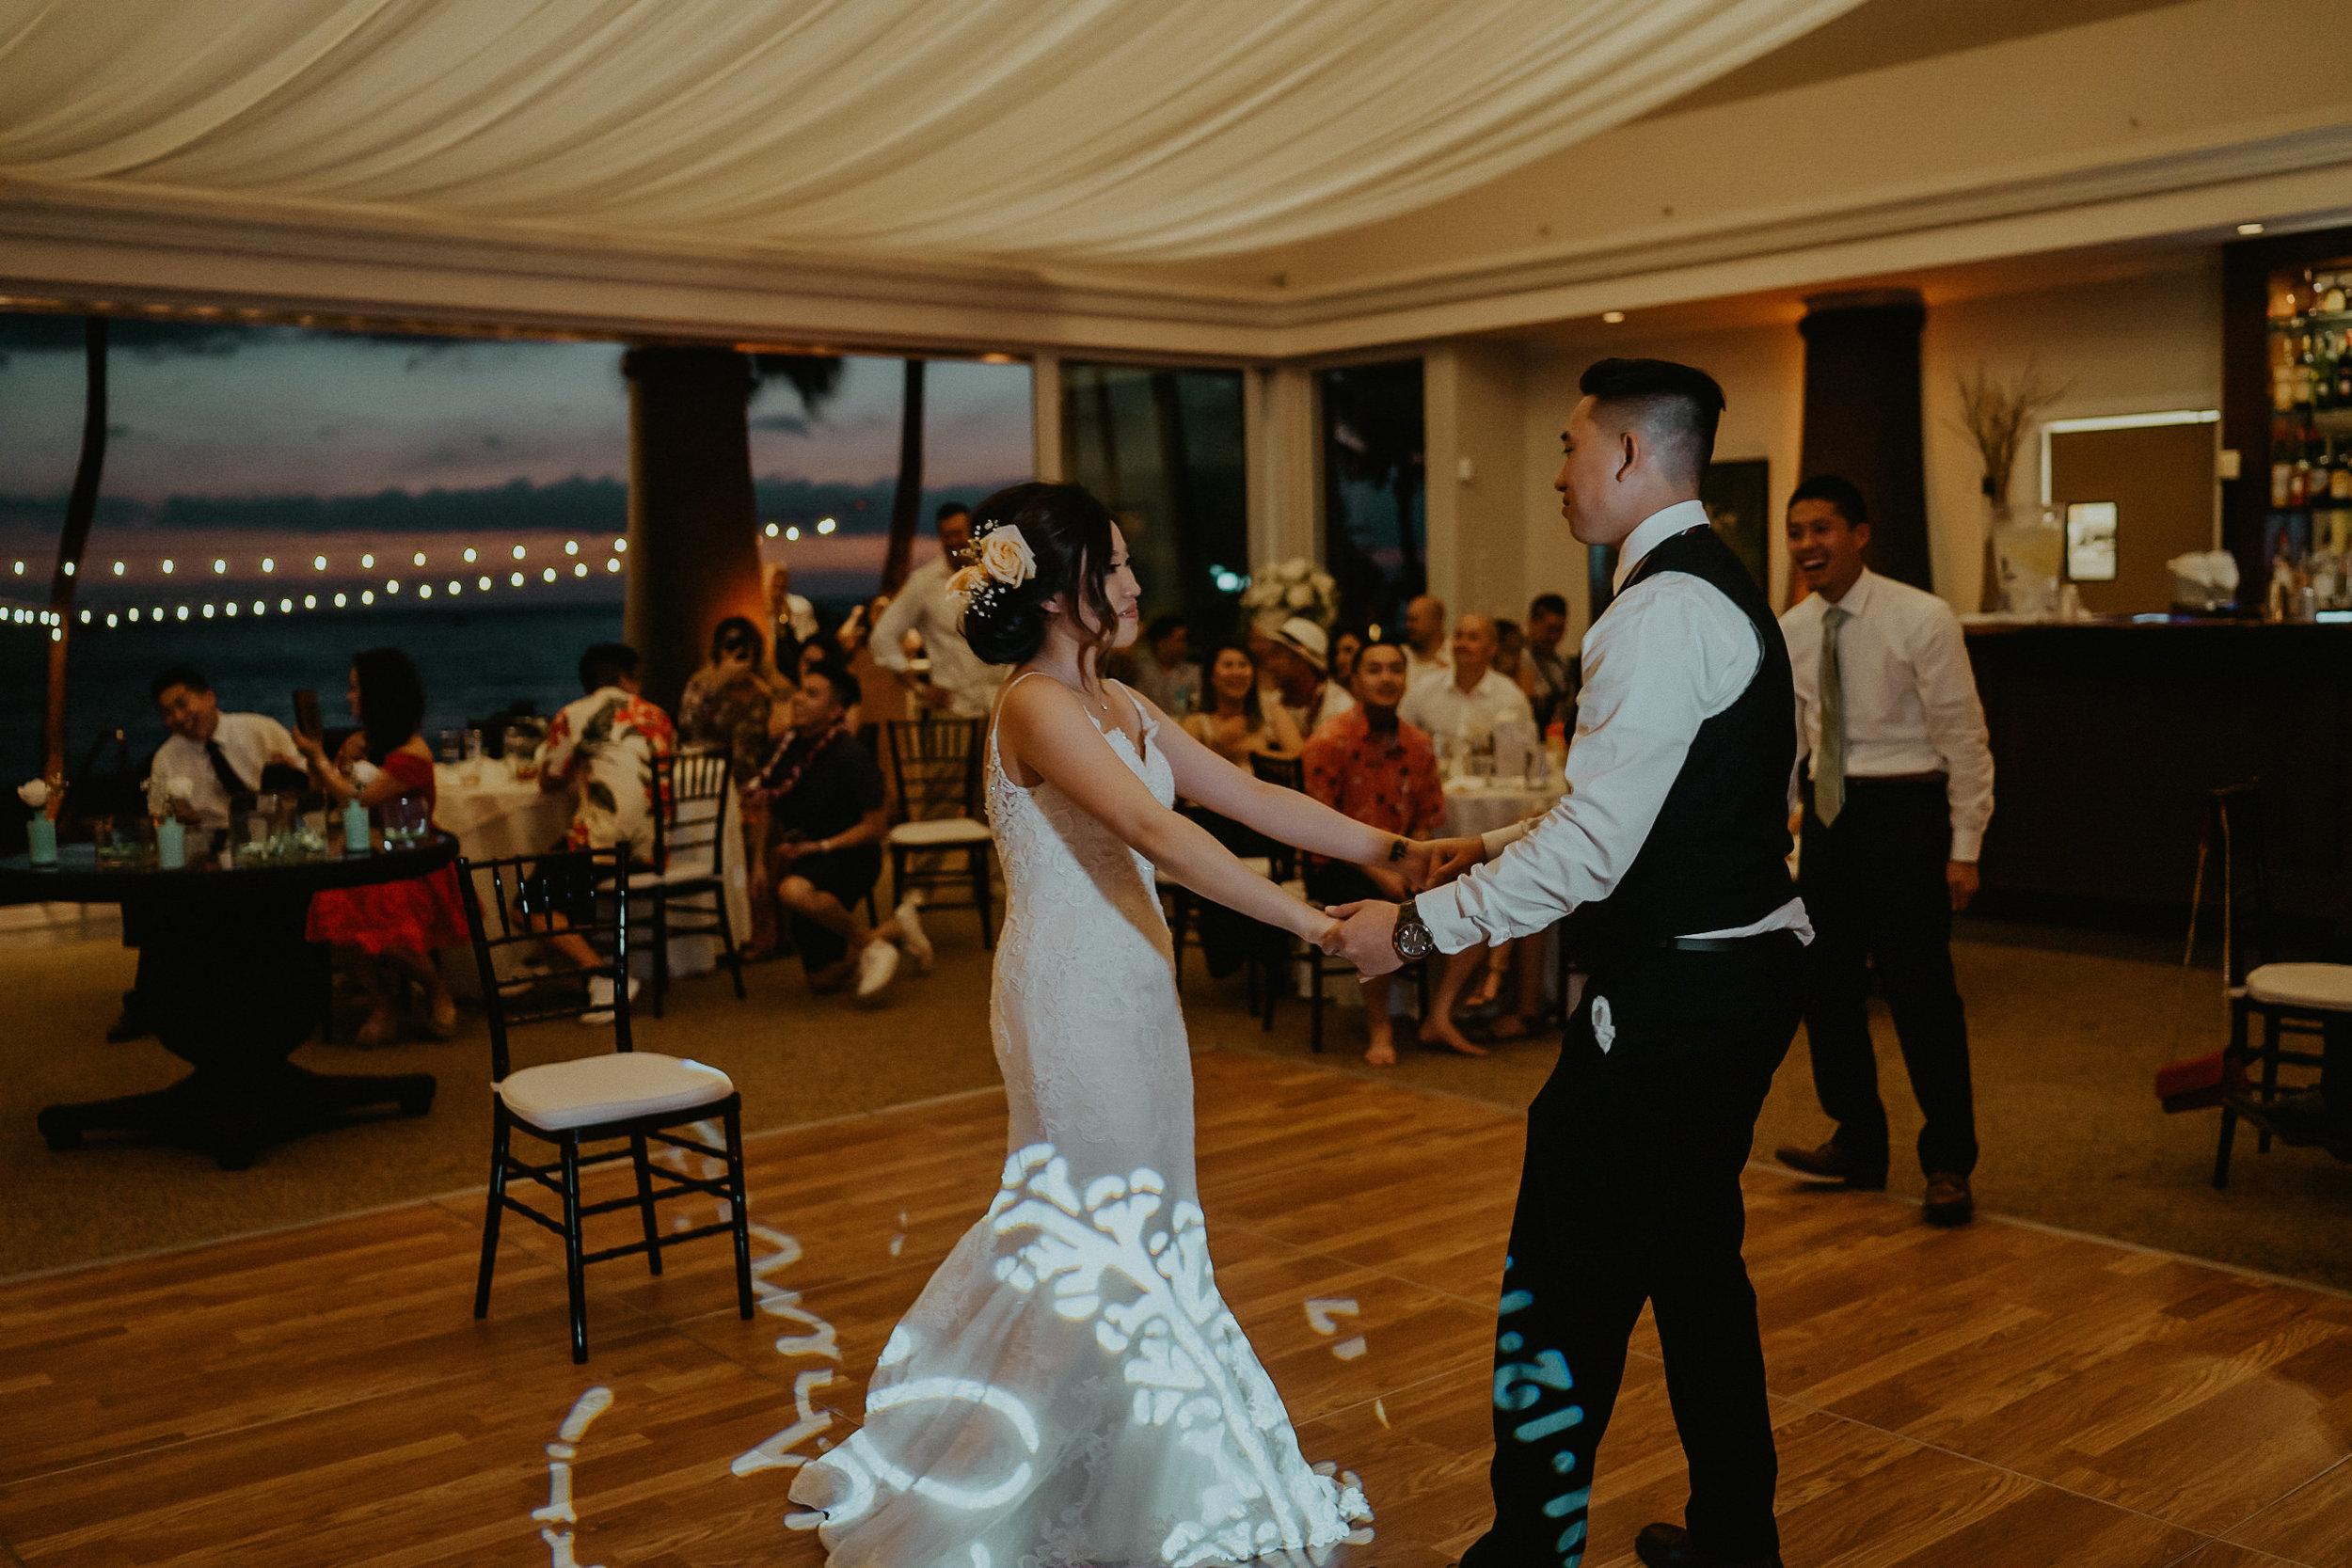 Maui_Destination_wedding_Alfred_Tang-85.jpg